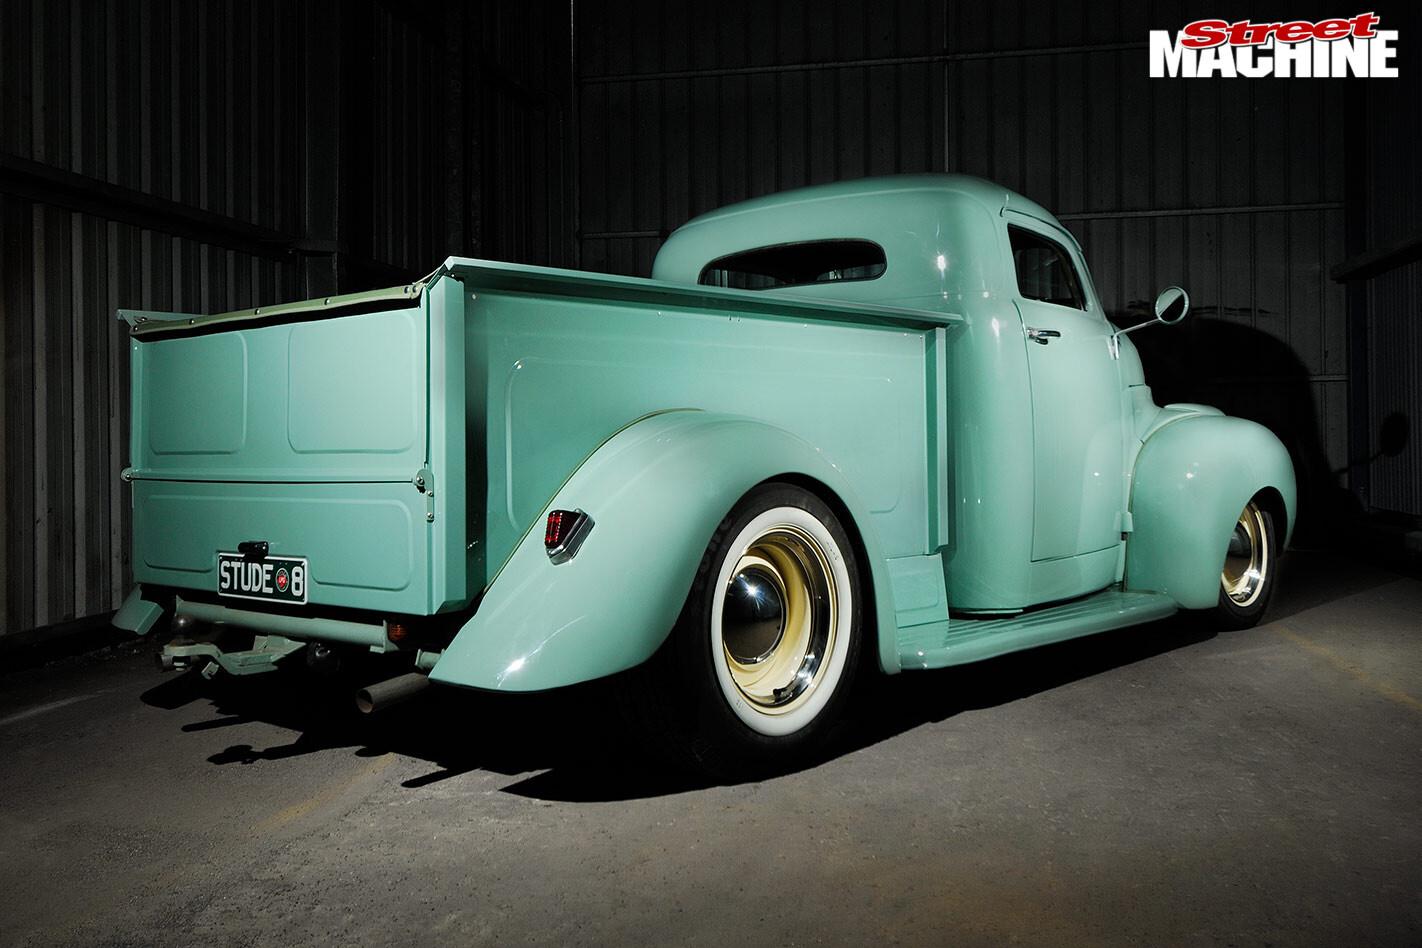 1948 Studebaker M5 pickup rear